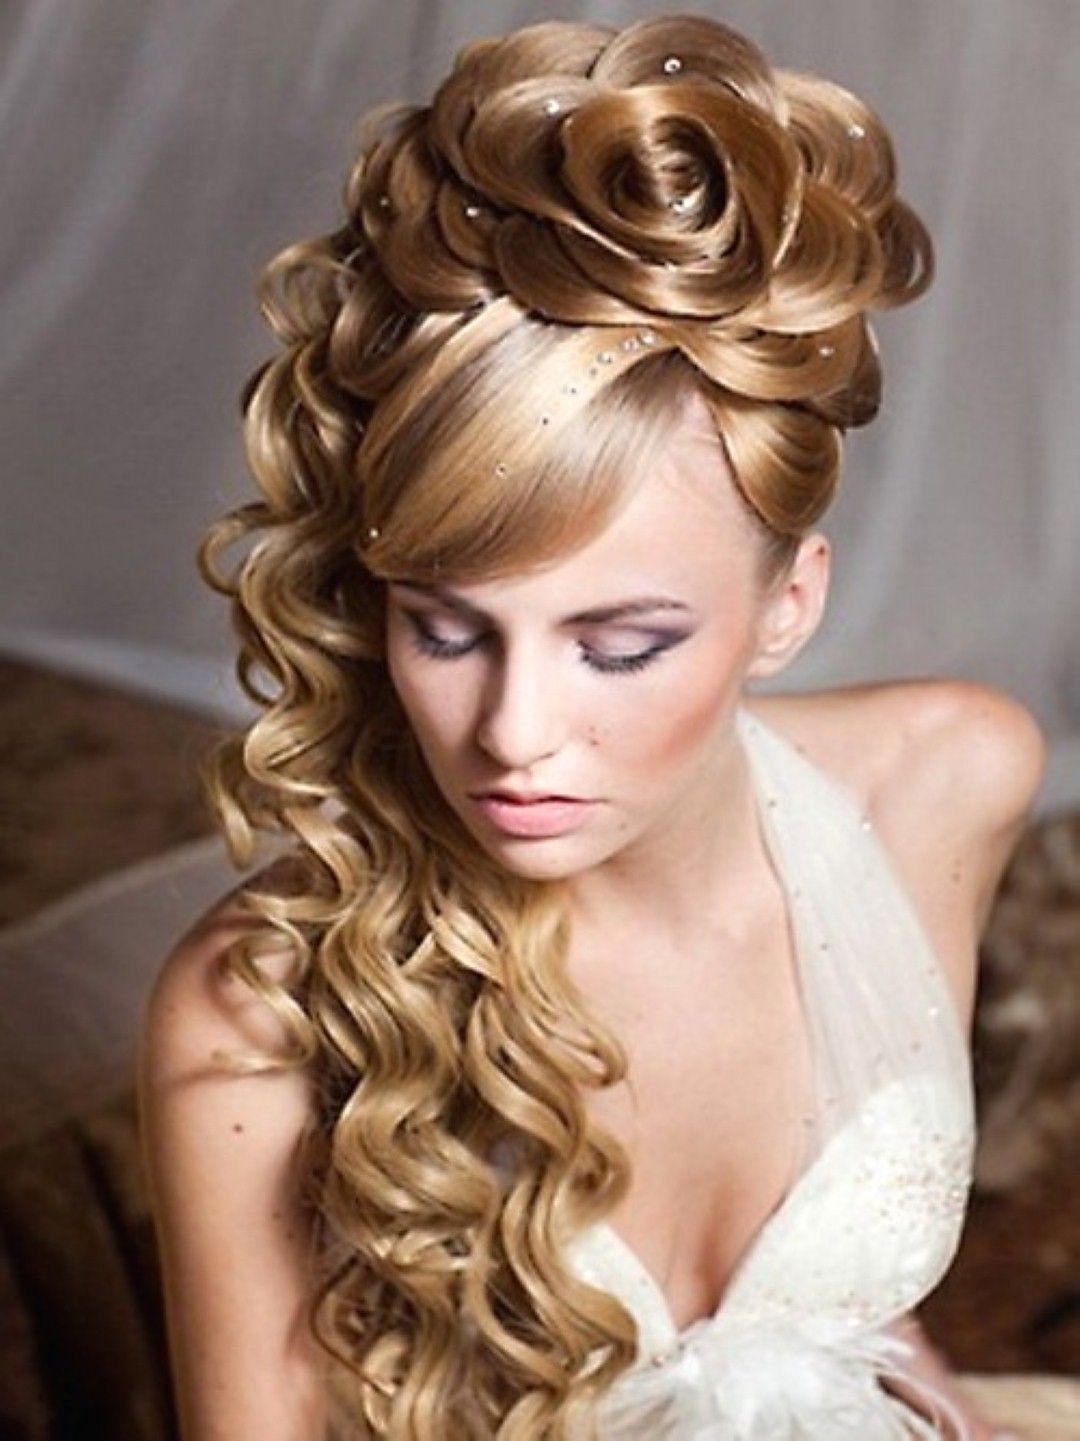 Short Hair French Twist Updo Short Hair Styles Easy Short Hair Updo Tutorial Short Hair Styles